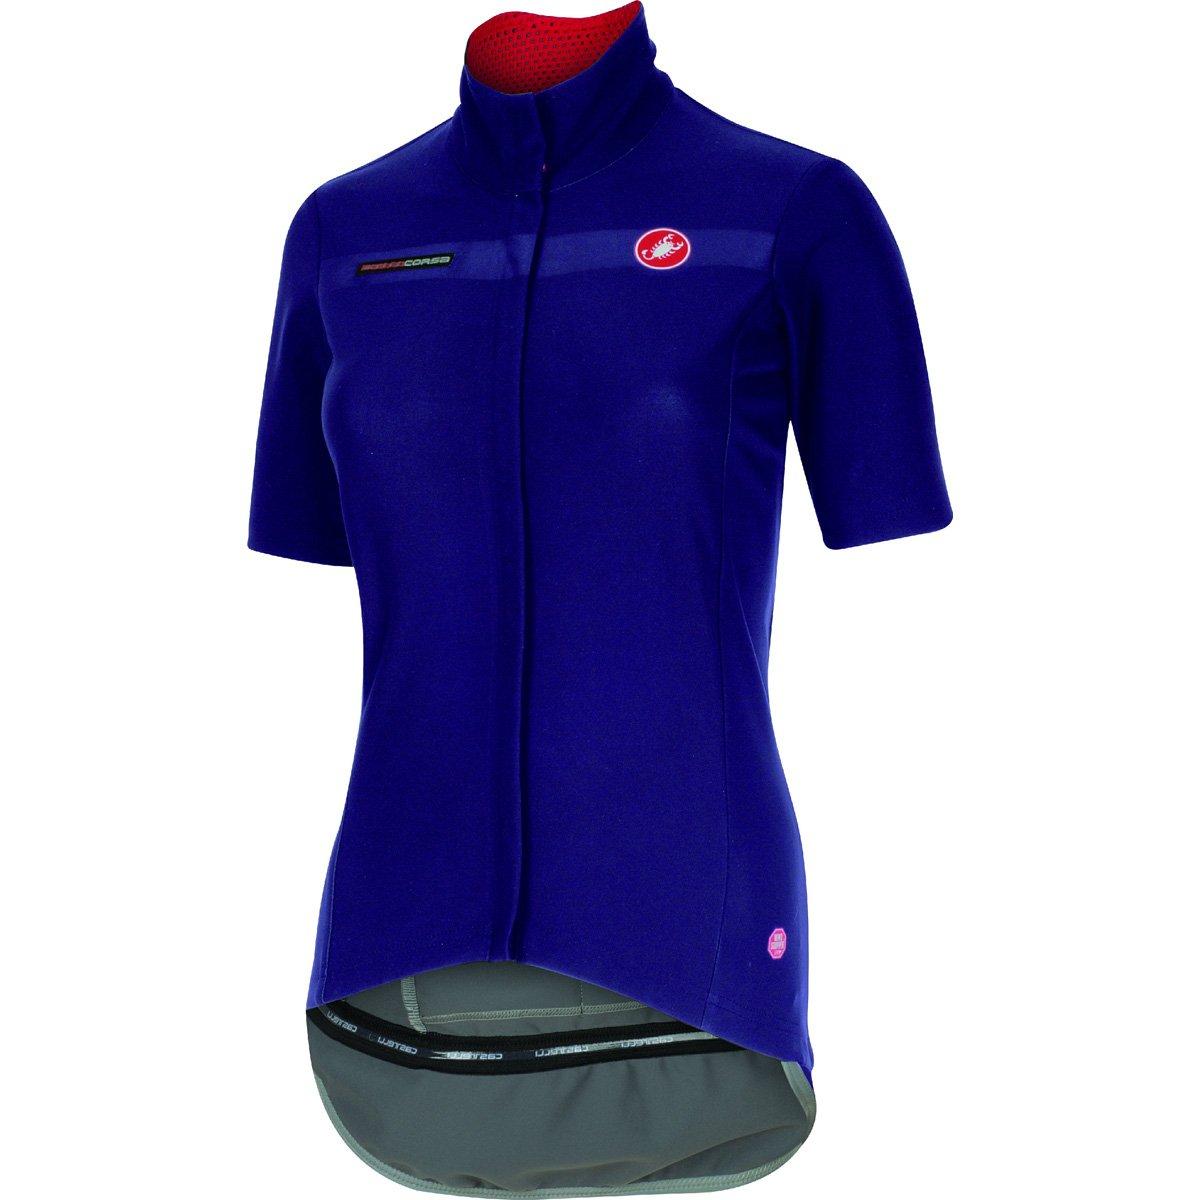 5369b2c2b Amazon.com   Castelli Gabba Jersey - Short-Sleeve - Women s   Sports    Outdoors